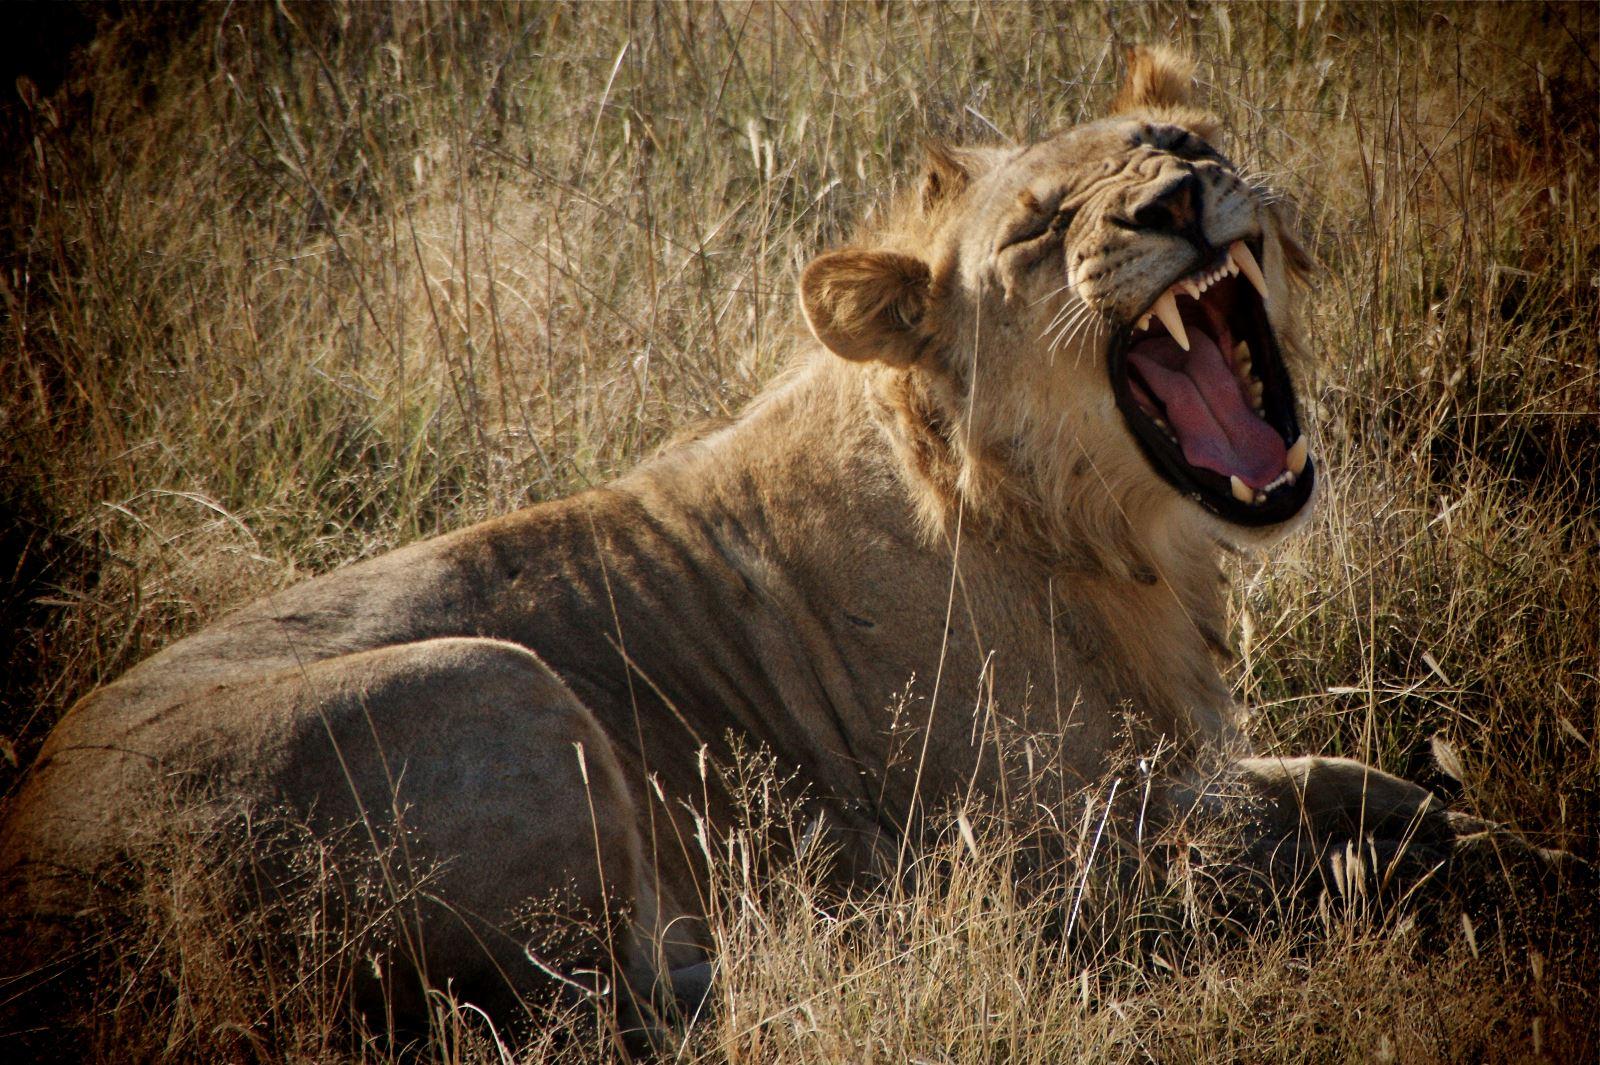 Safari and Lion Encounter at Etosha National Park, Namibia